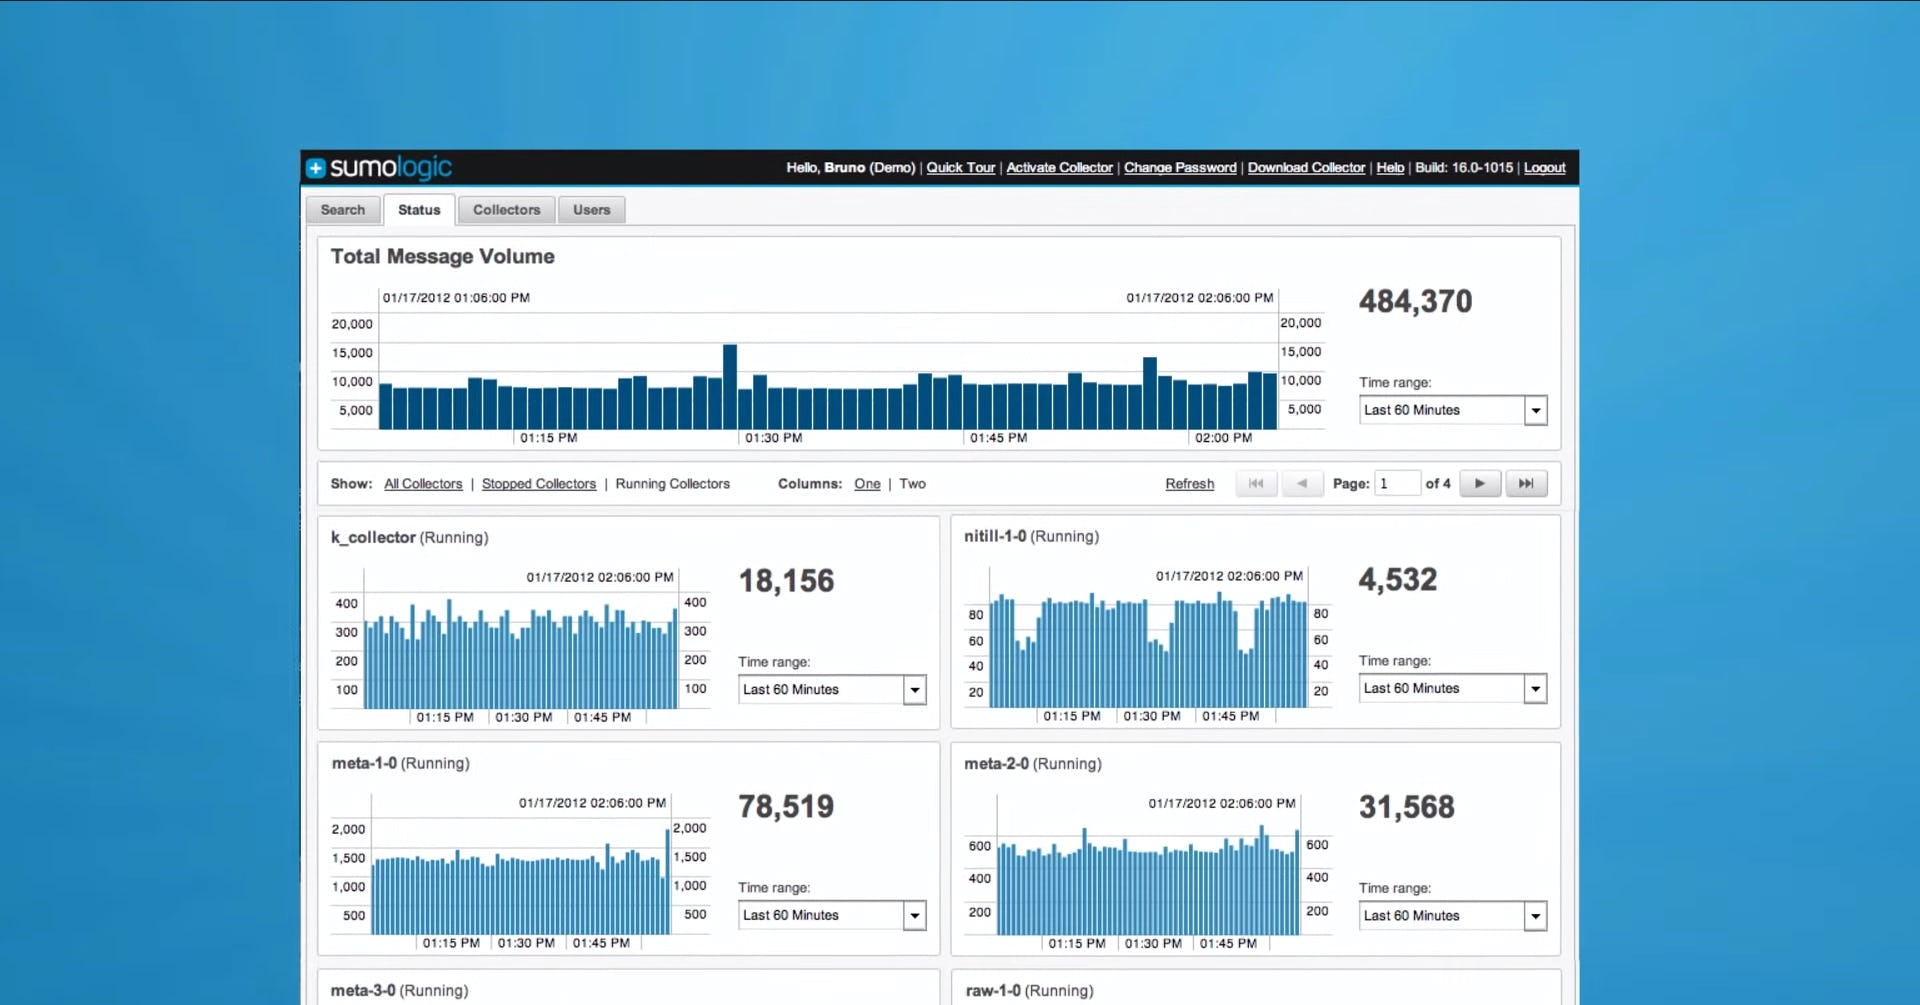 Sumo Logic Software - Analytics